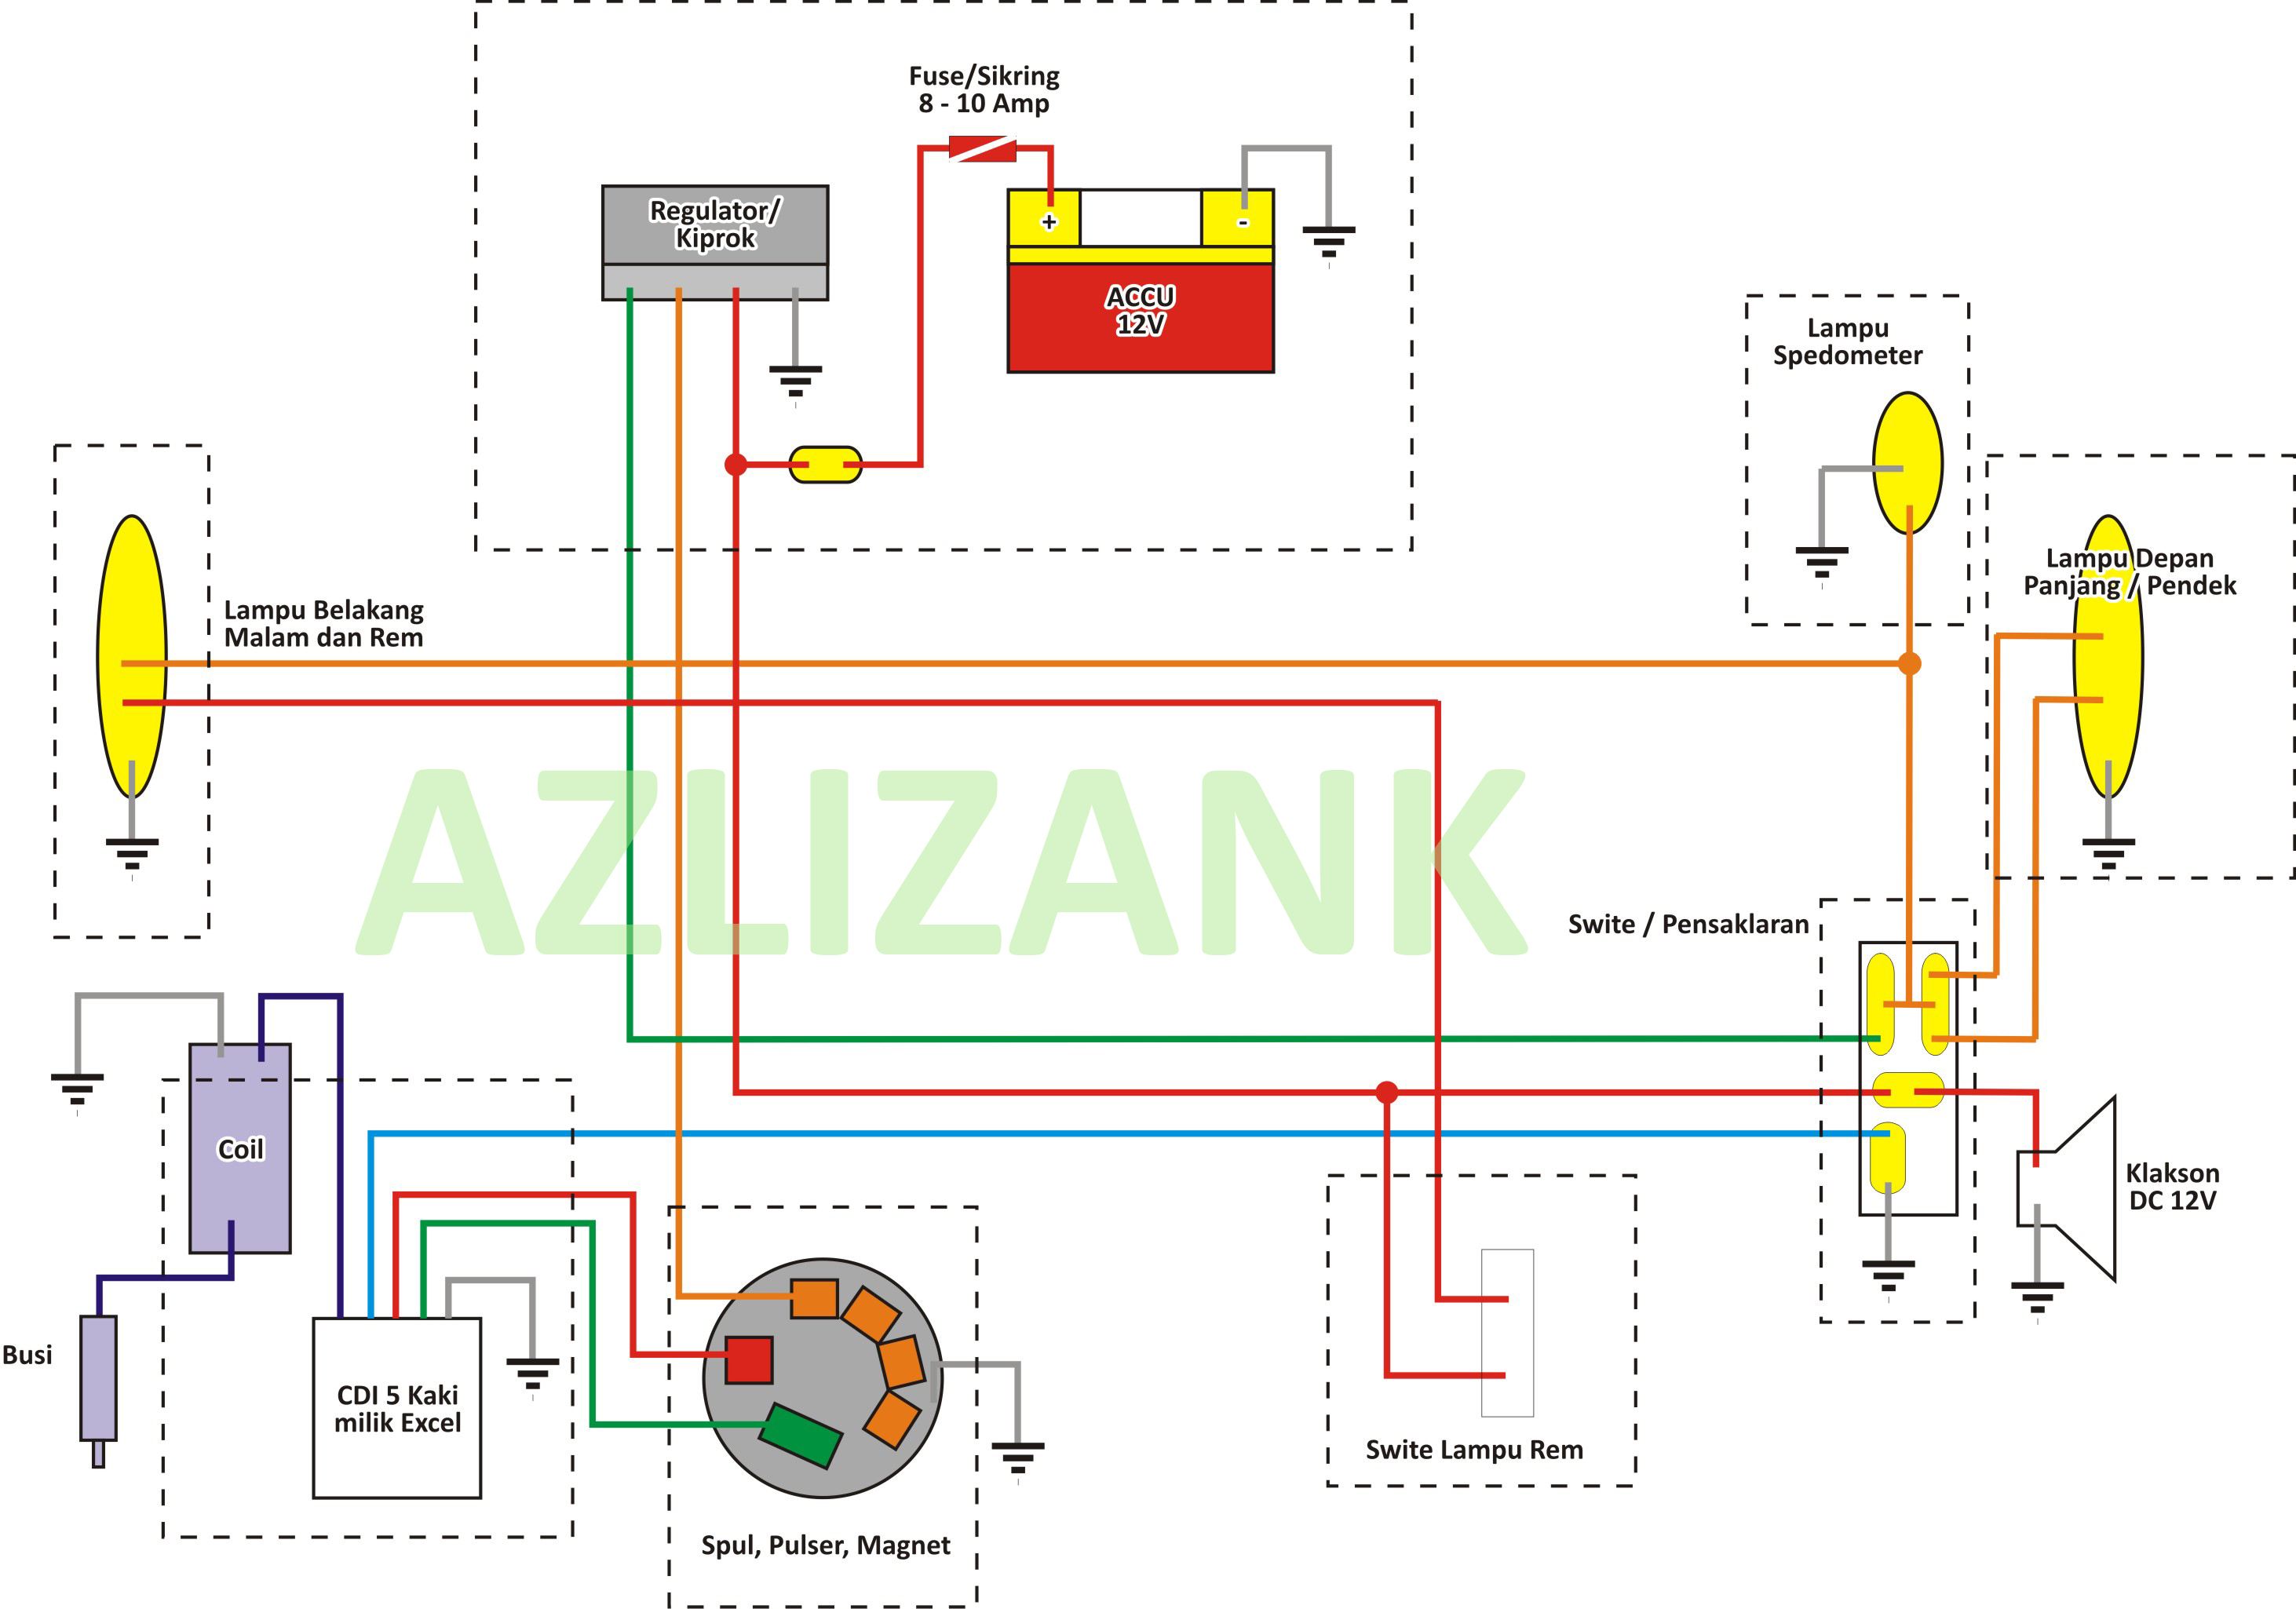 Wiring diagram silahkan kunjungi on 8 pin cdi wiring diagram skema kelistrikan vespa px sederhana azli zank rh azlizank wordpress com ccuart Gallery